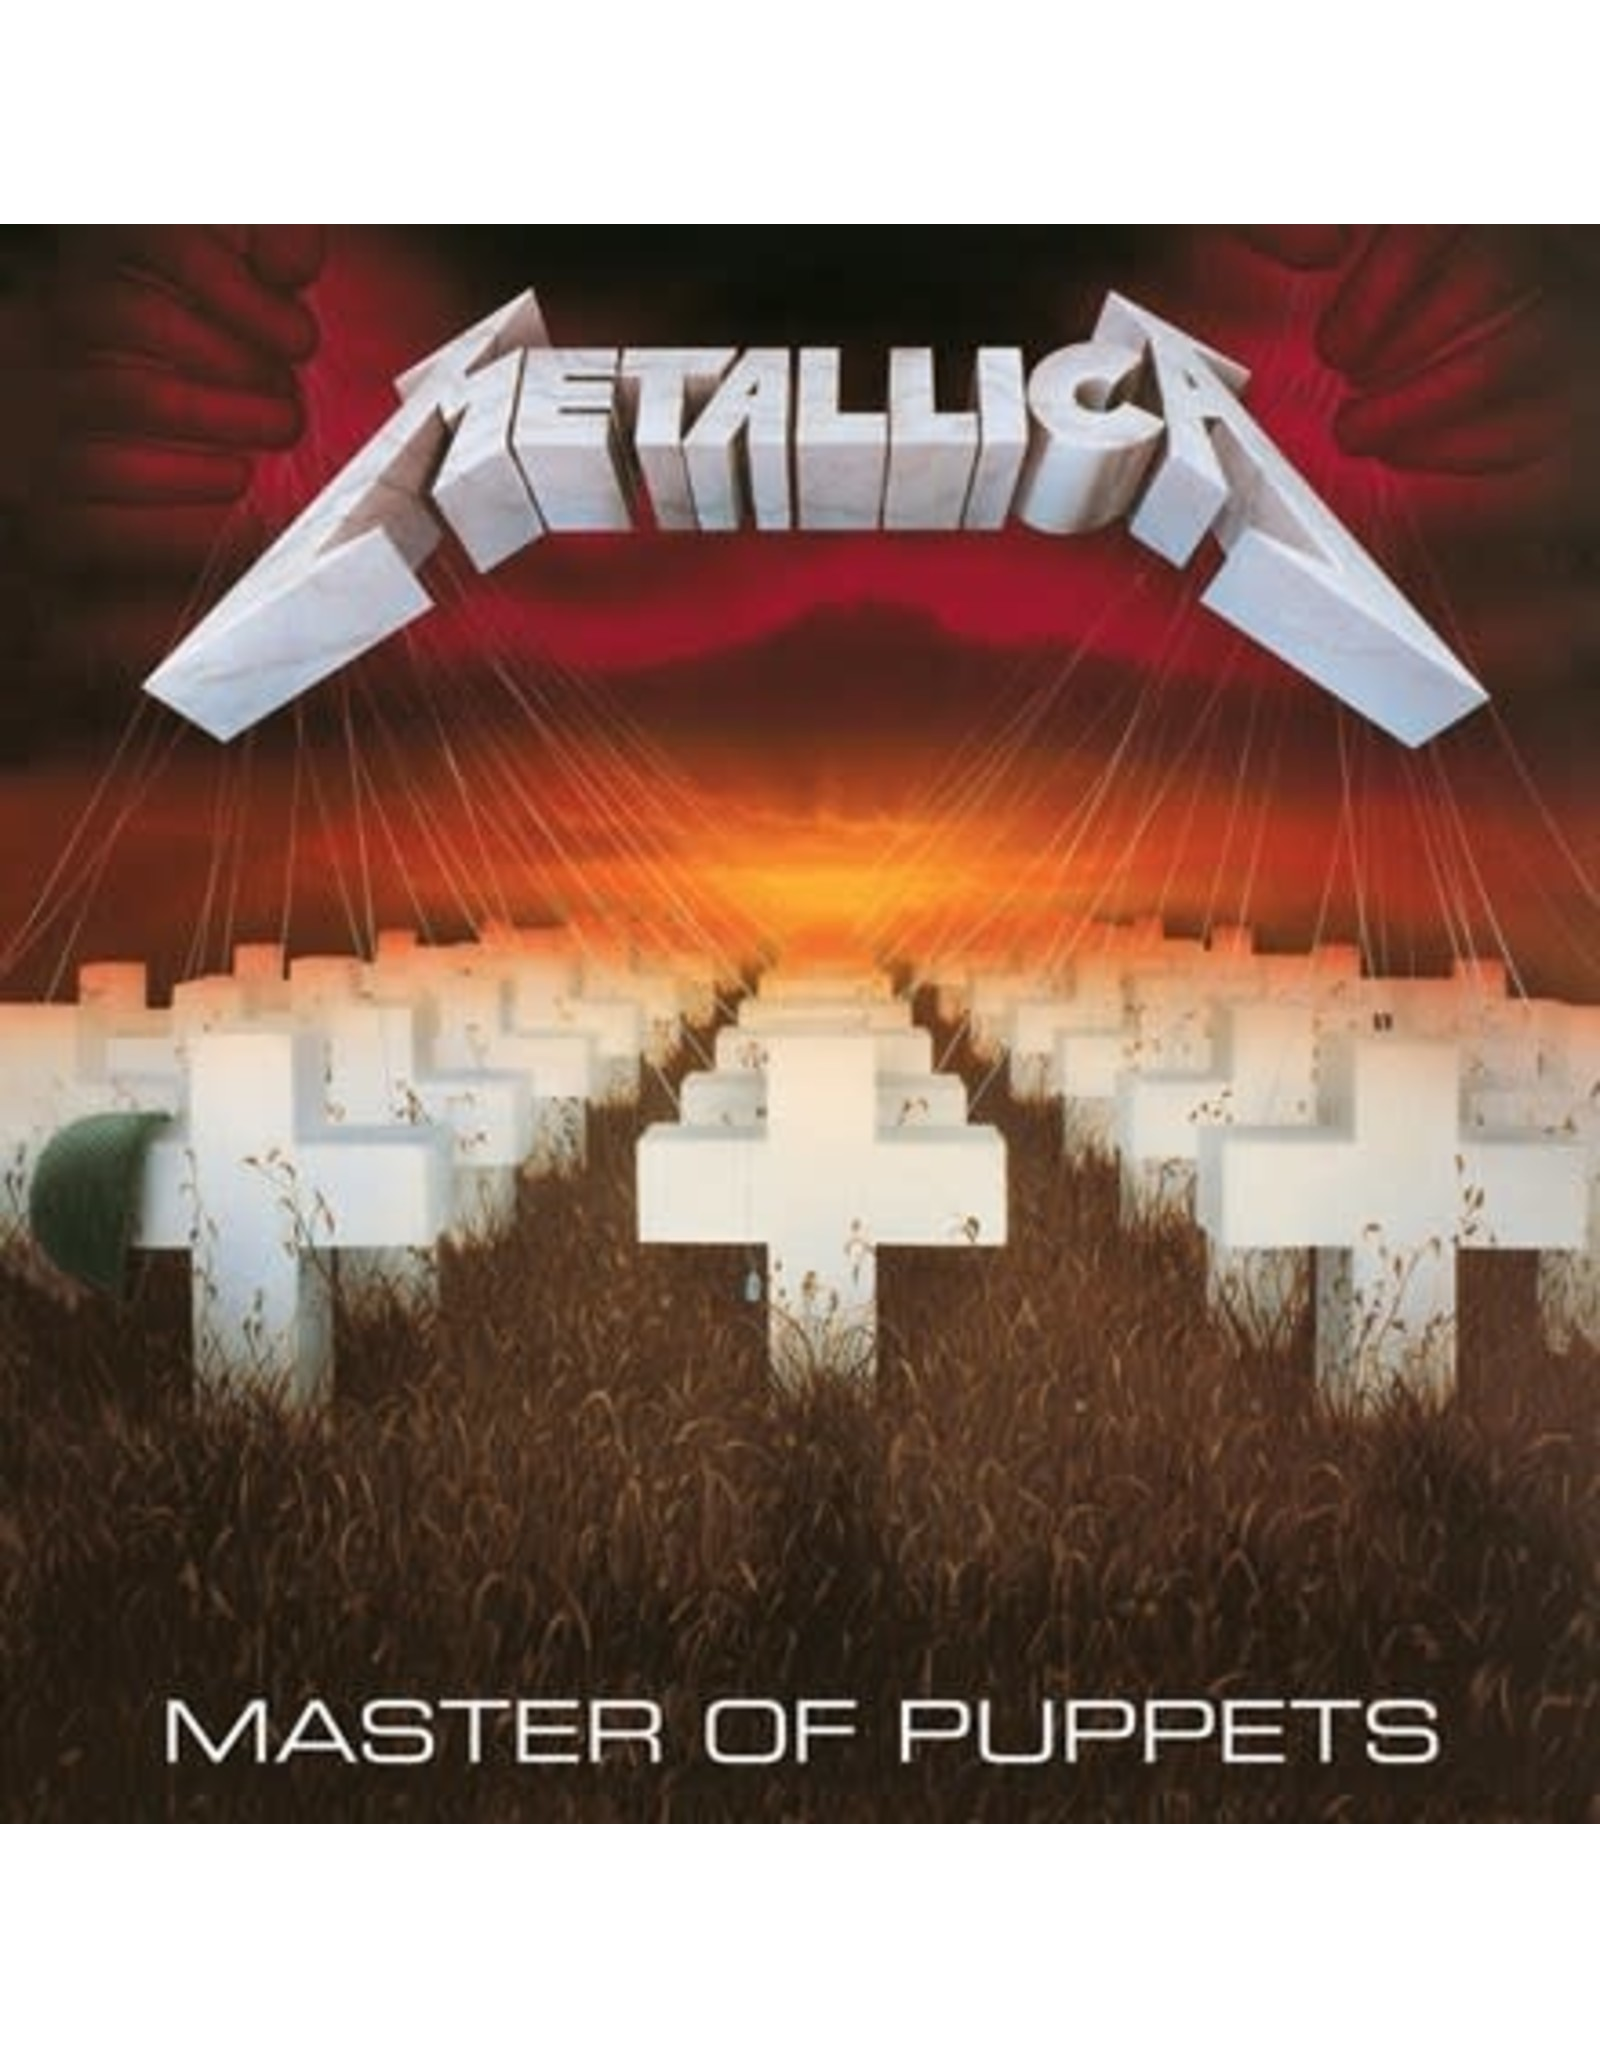 Blackened Metallica: Master of Puppets LP